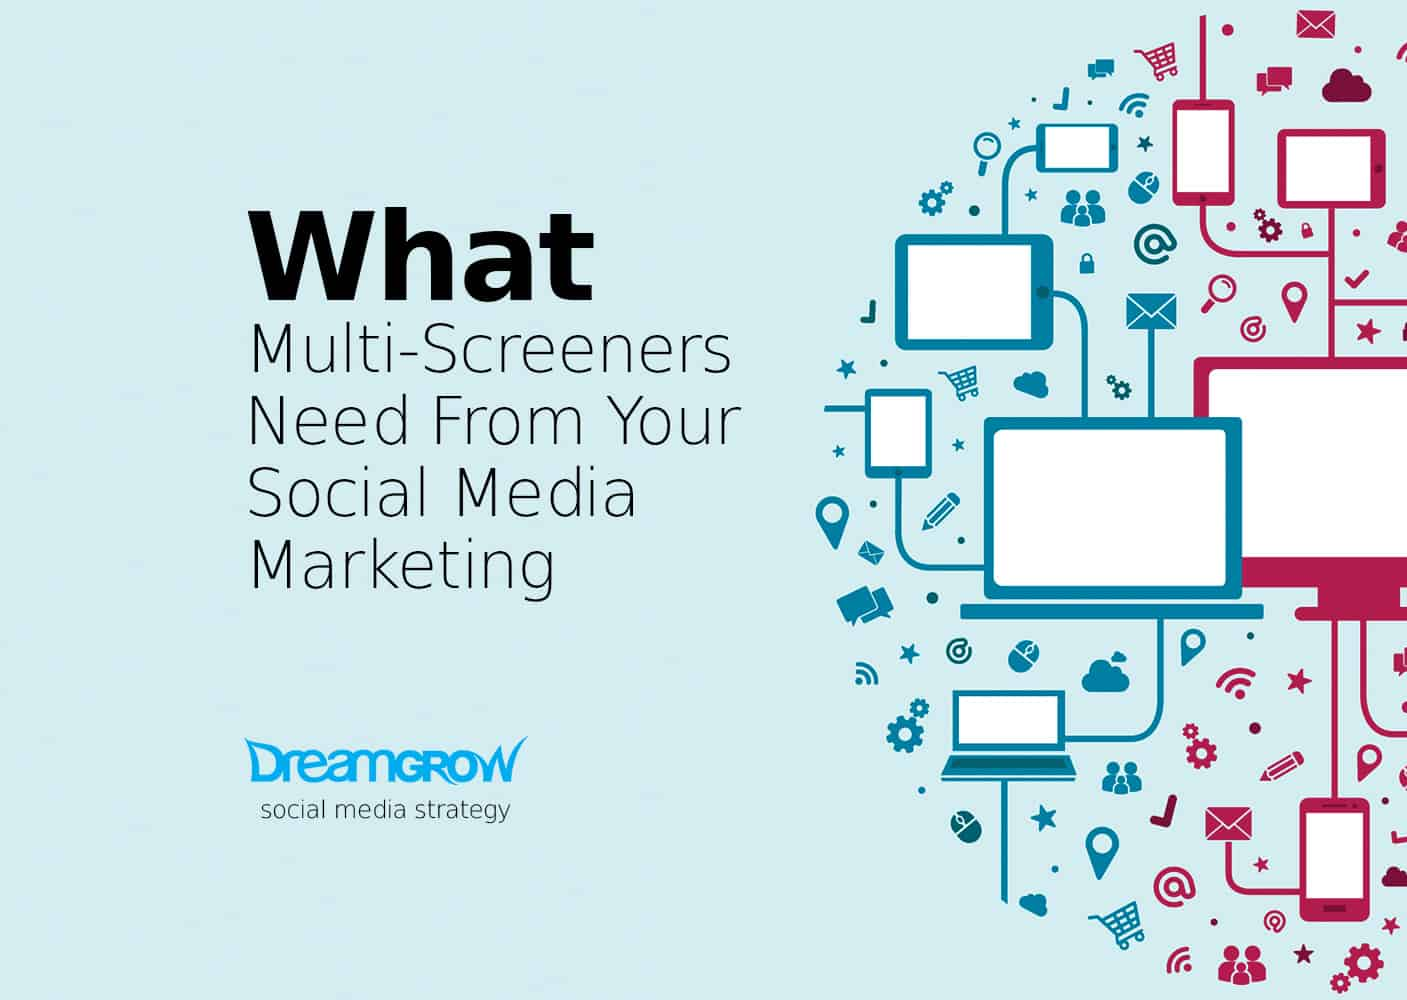 multi-screeners social media marketing